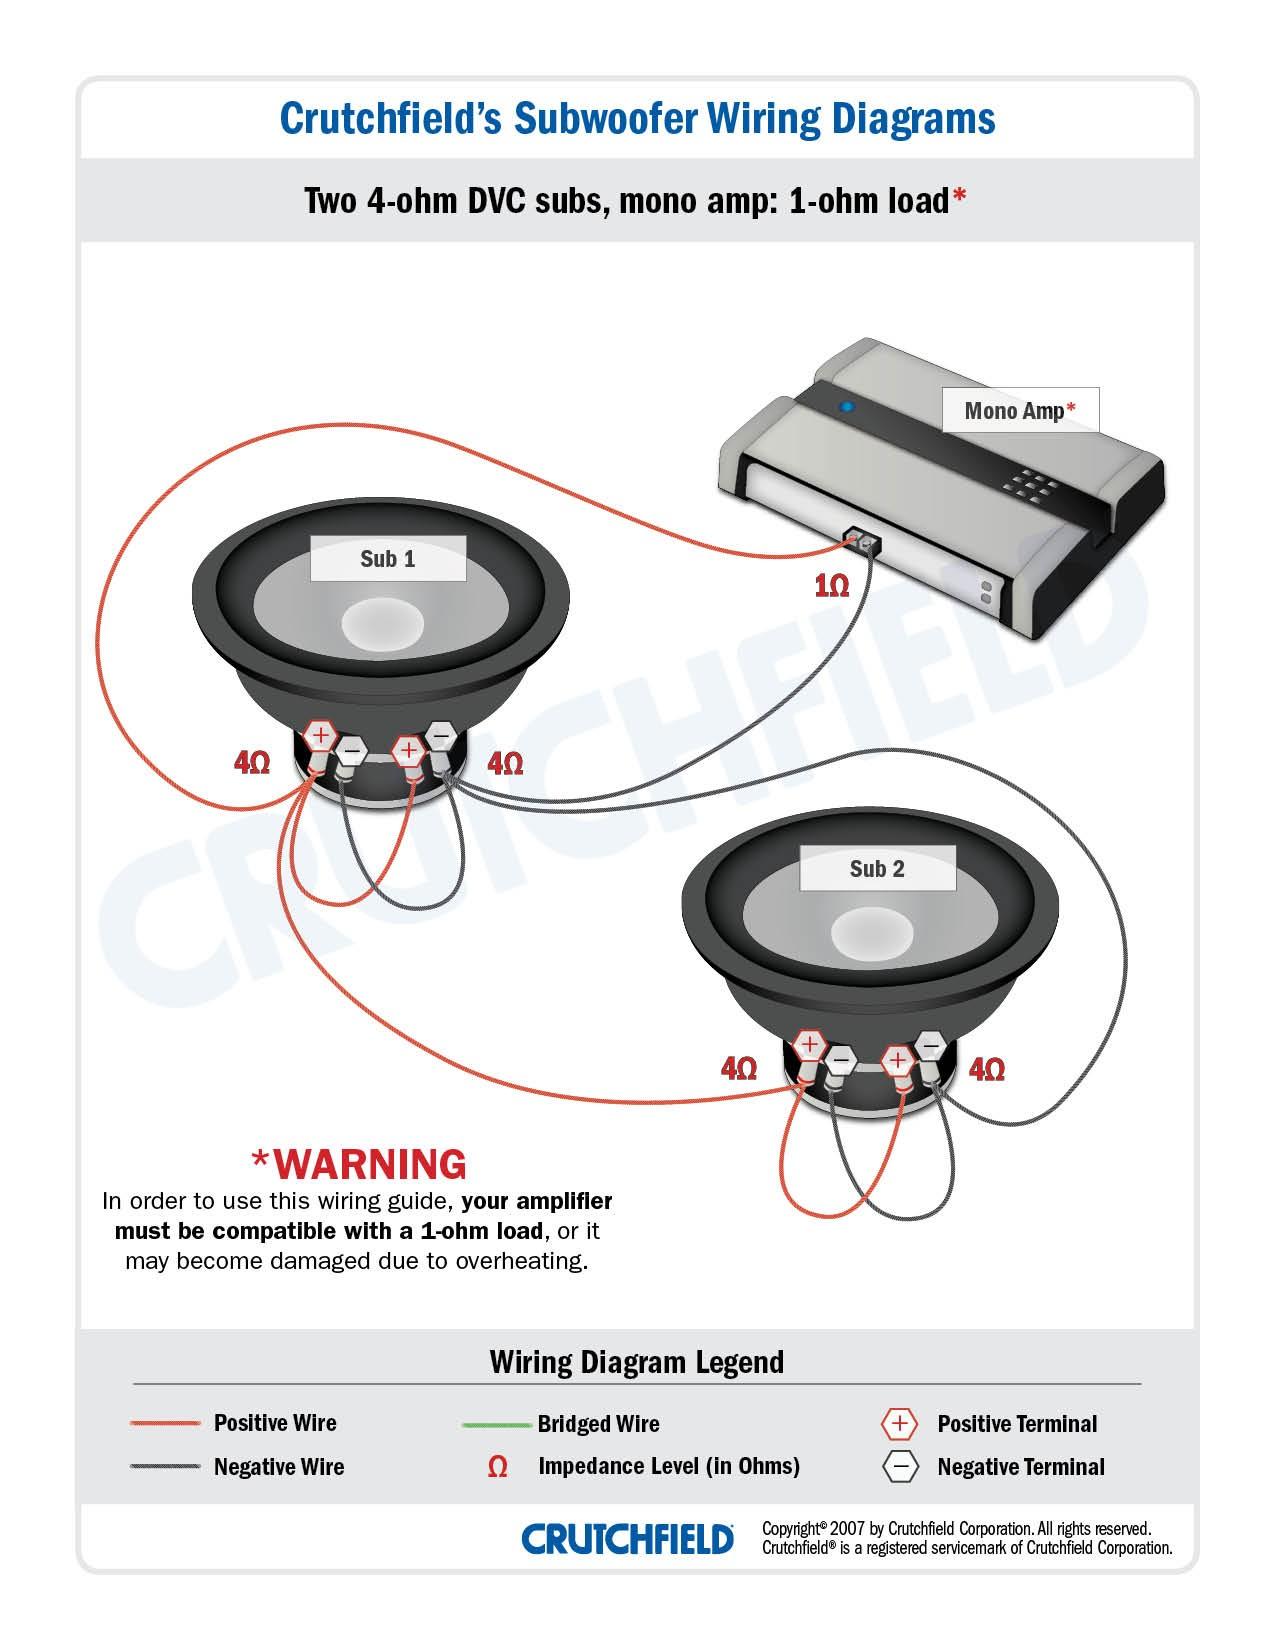 Car Stereo Amp Installation Diagram sound ordnance M350 1 Of Car Stereo Amp Installation Diagram